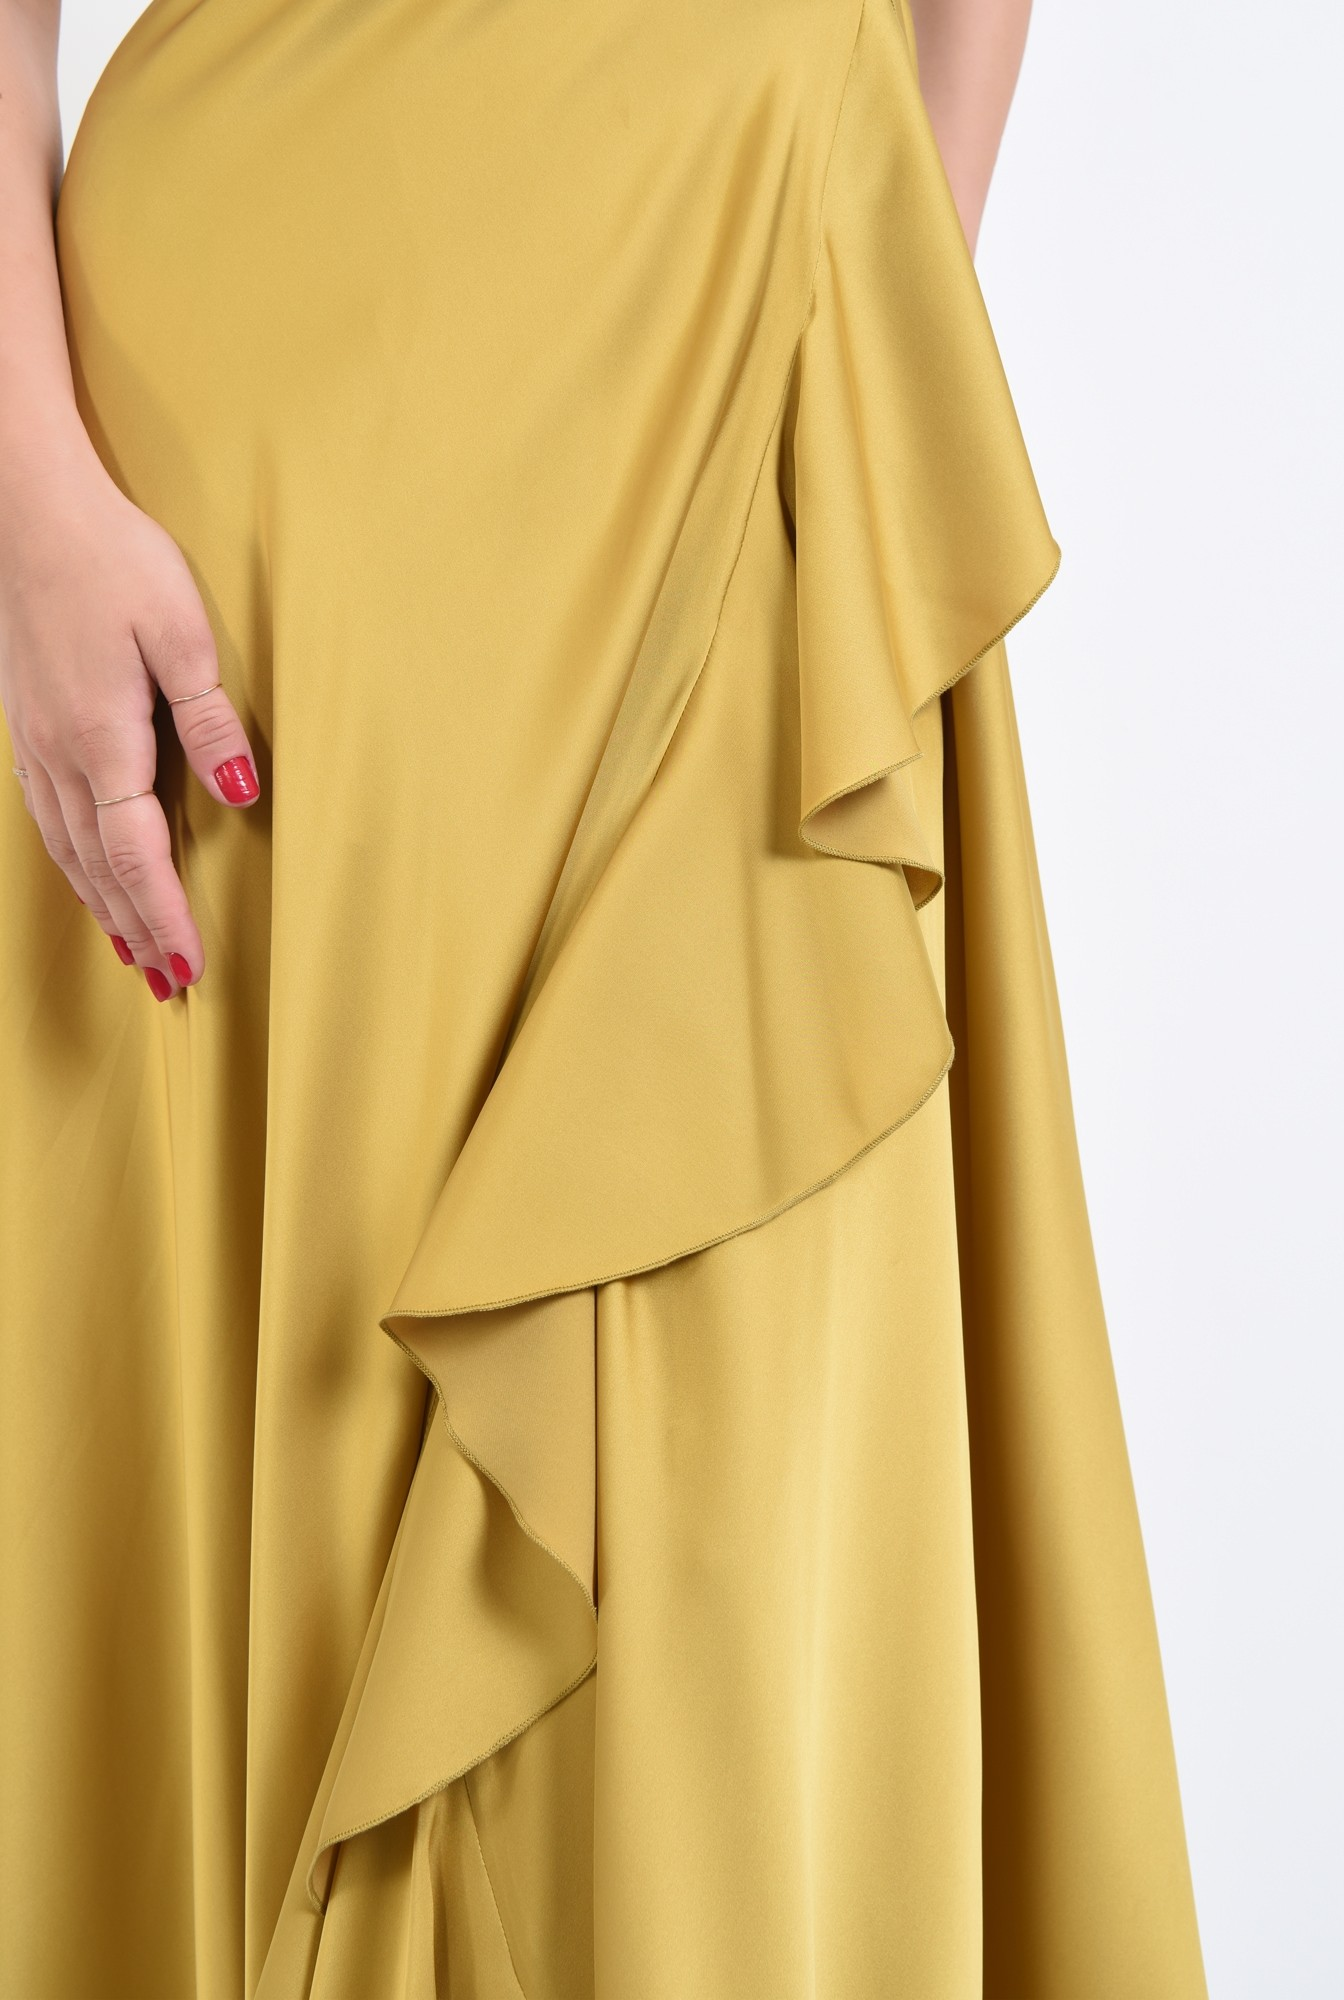 2 - rochie de seara, maxi, anchior, parte peste parte